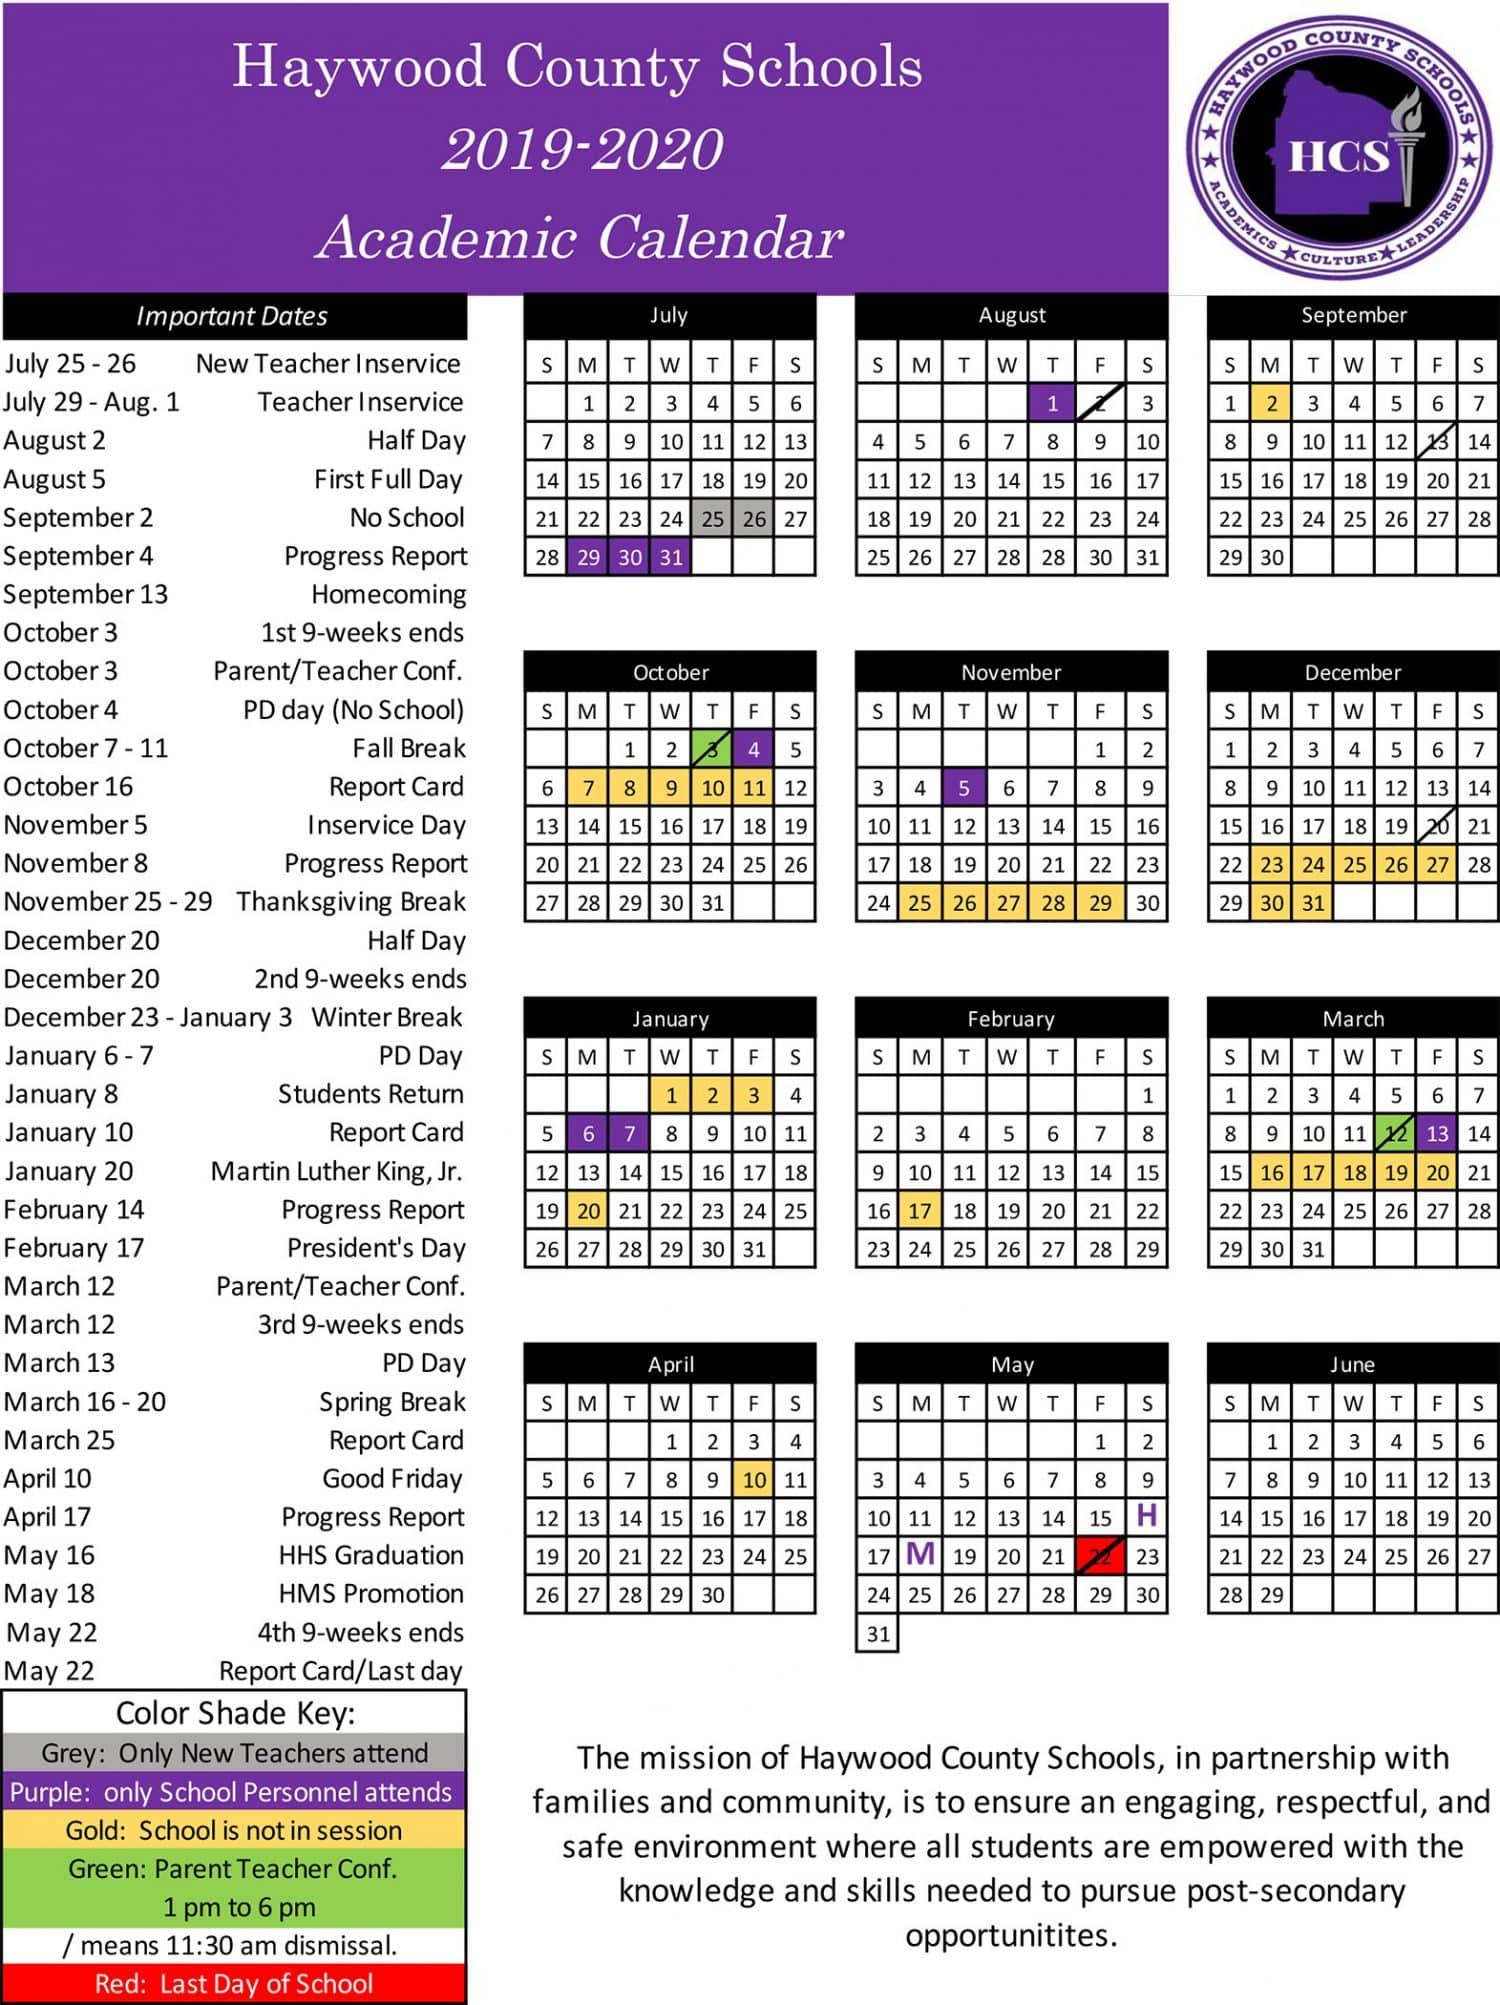 School Calendar | Haywood County Schools Intended For Dare County School Calendar